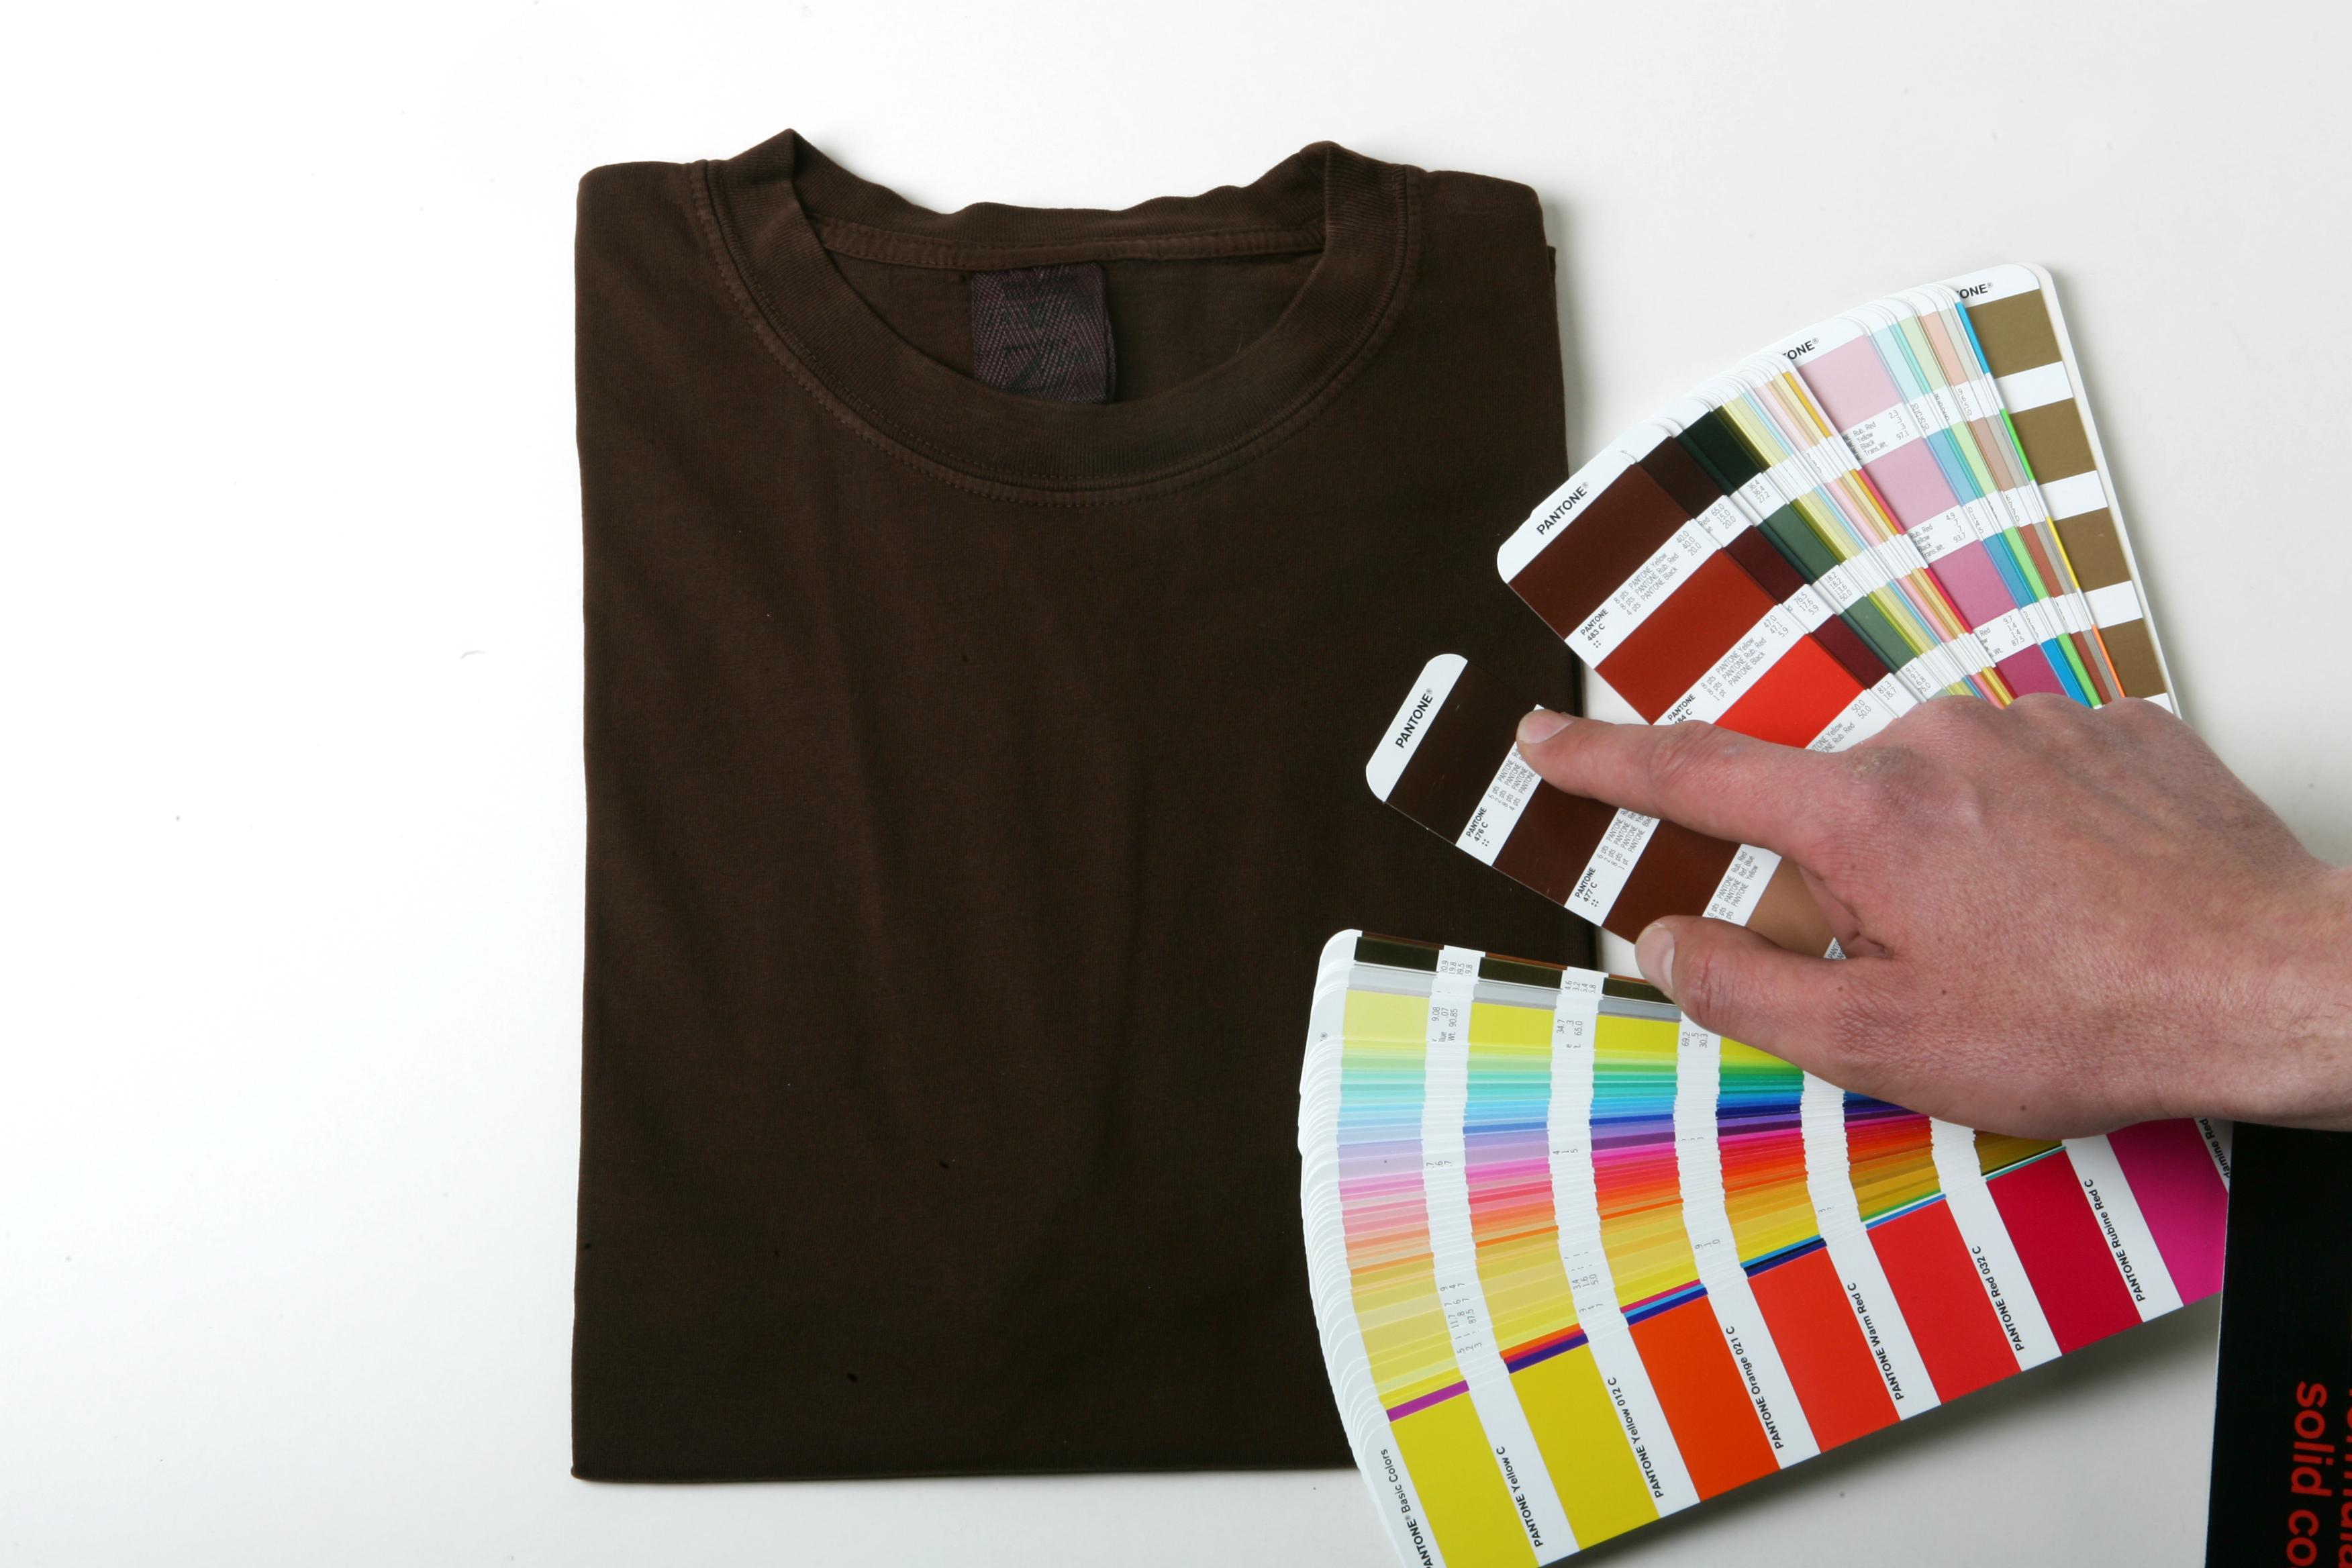 Pantone dyed T-Shirts